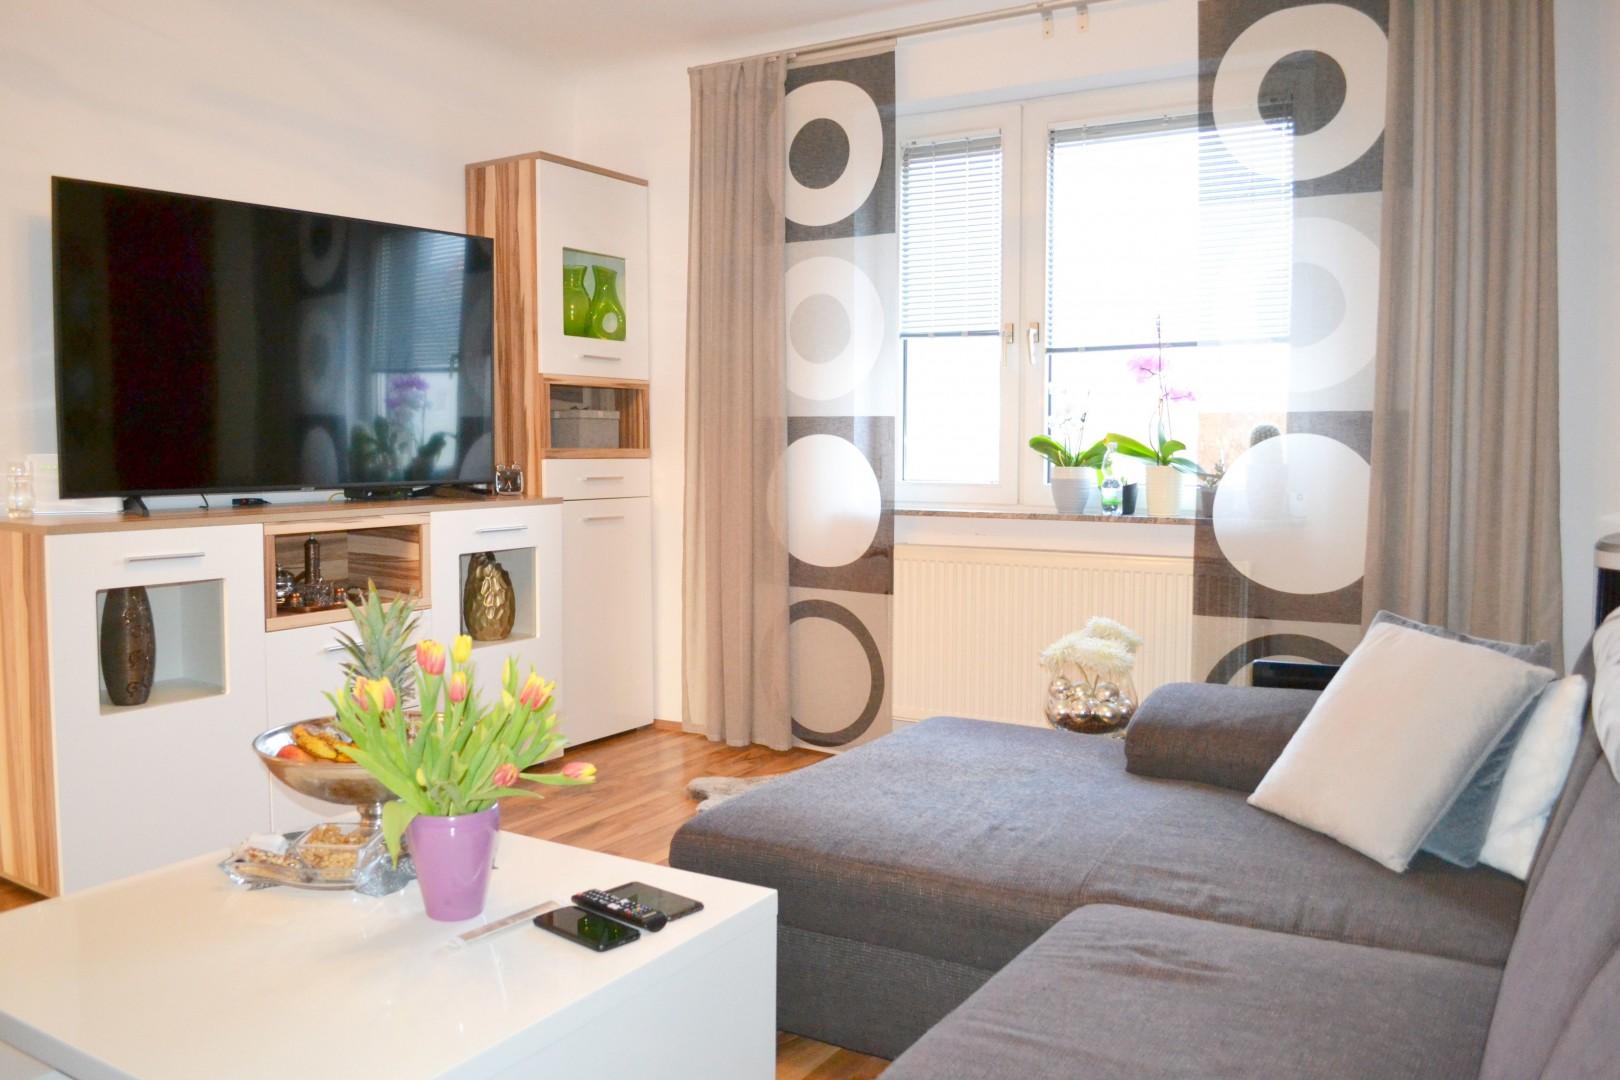 Moderner Neubau nahe U1! Ideal für Jungfamilien!